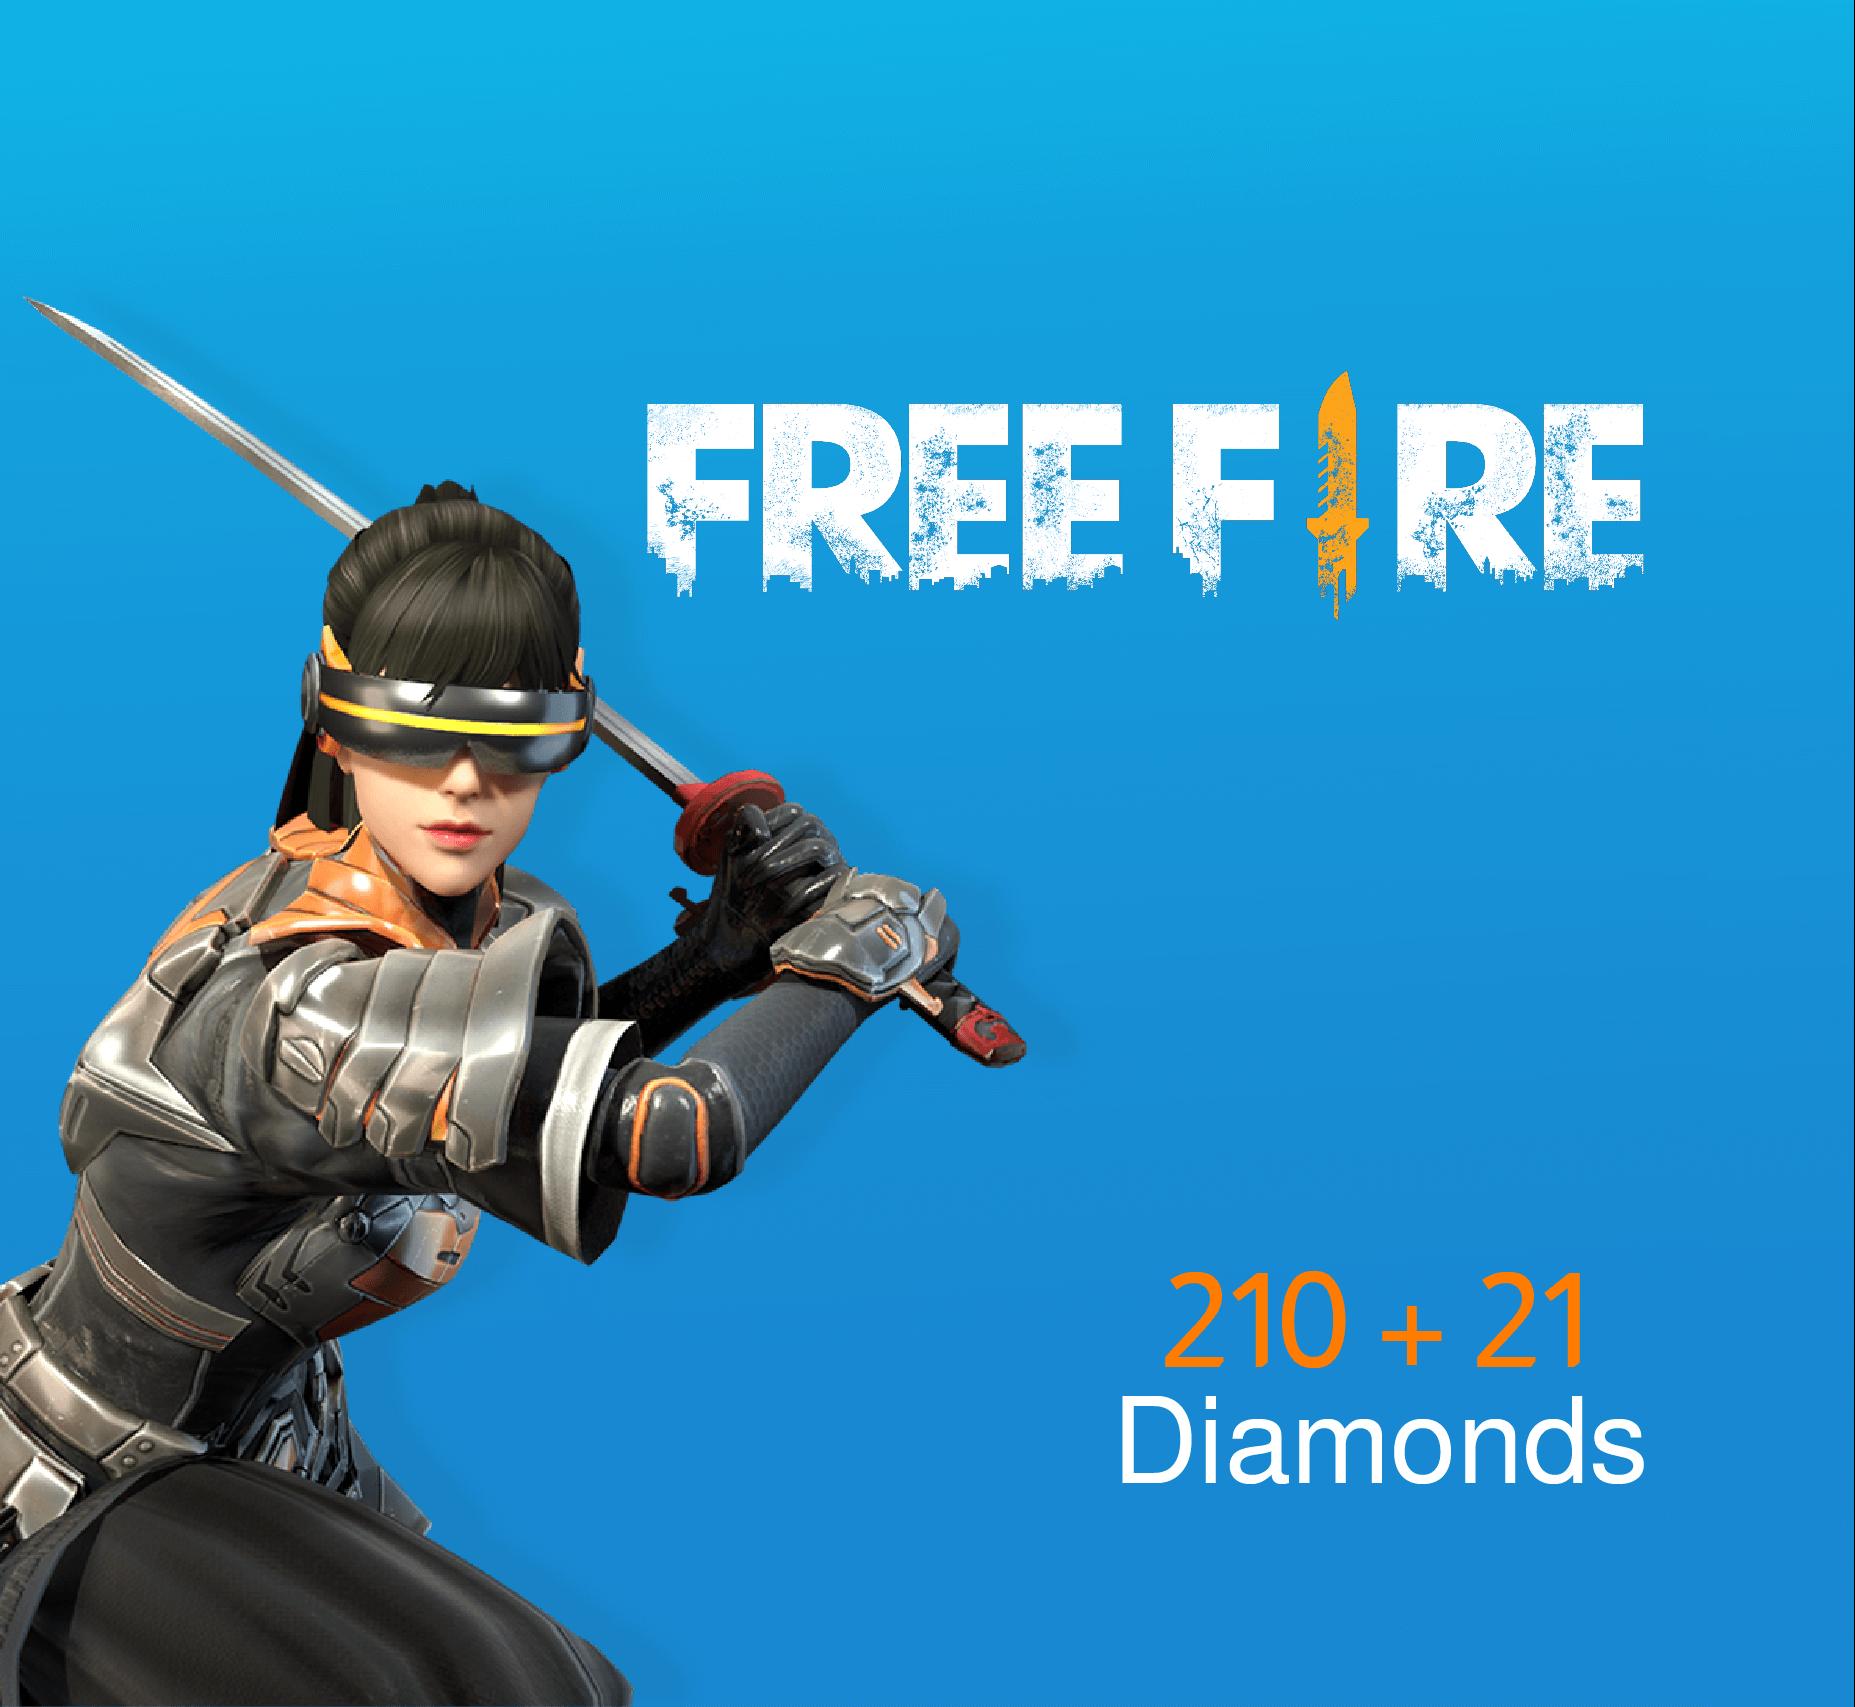 Free Fire Pins 210 + 21 Diamonds